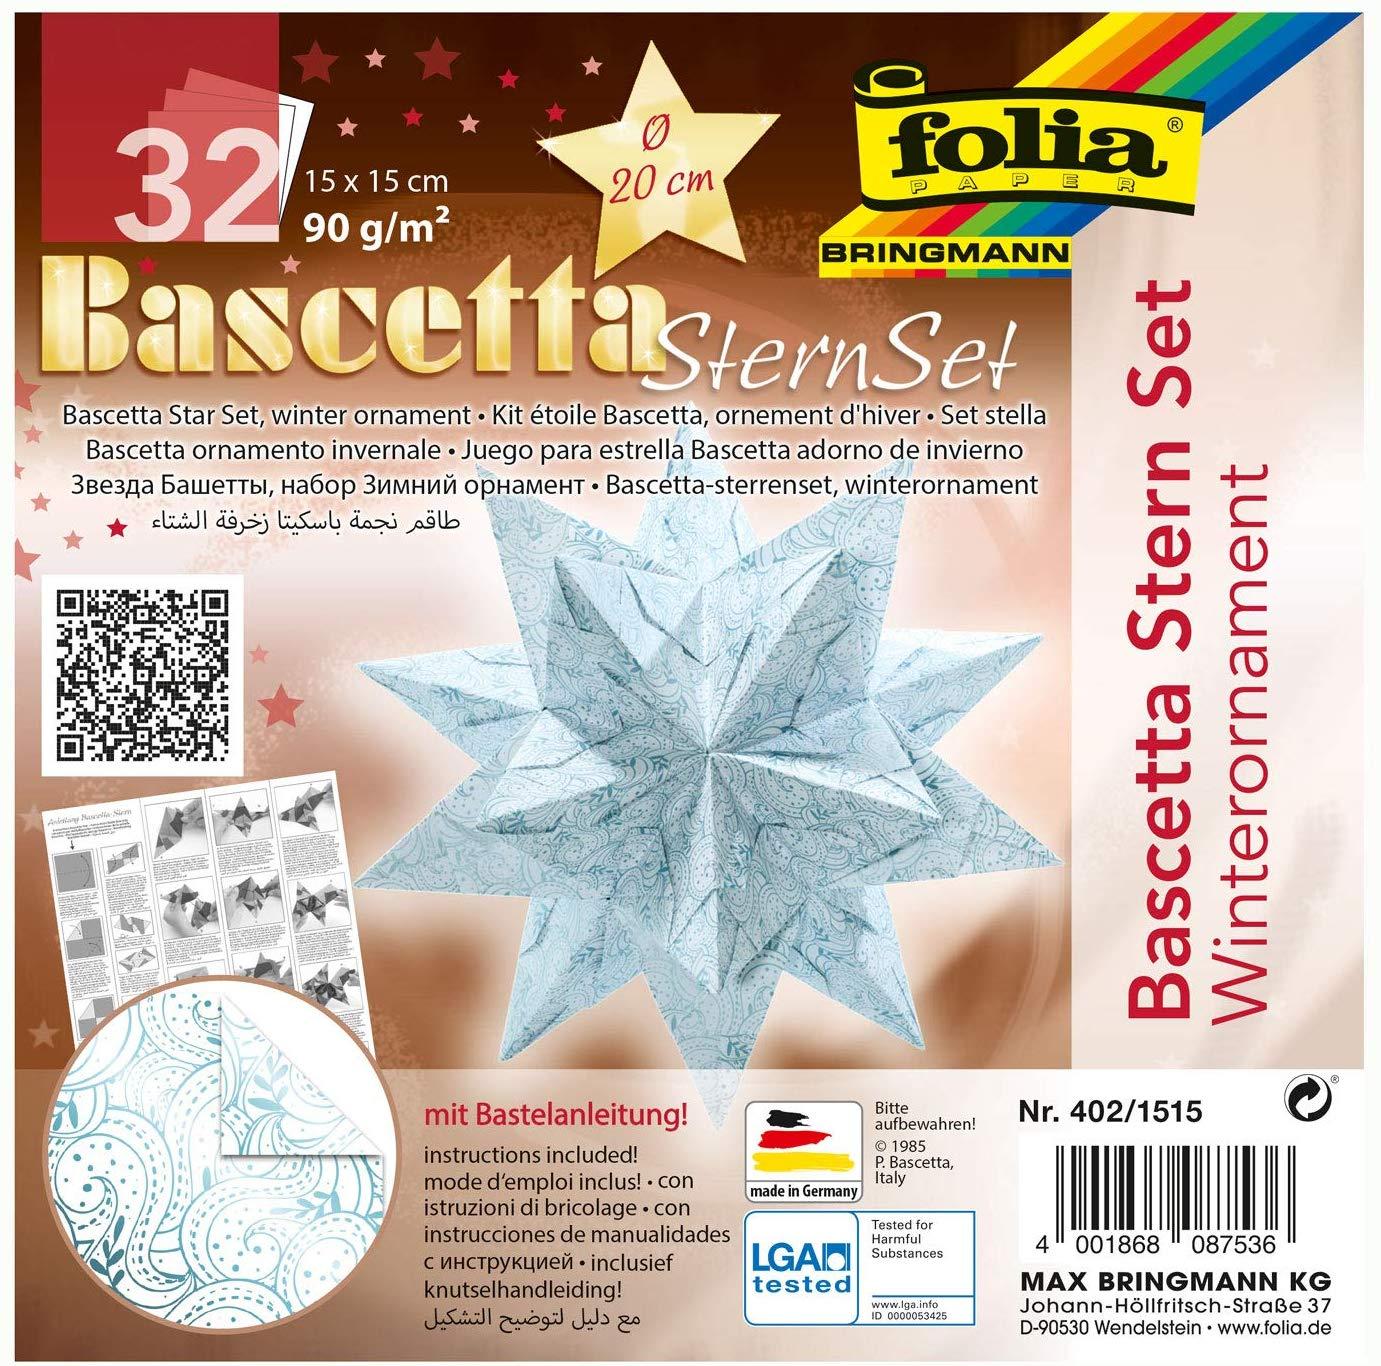 folia 402/1515 - Bastelset Bascetta Stern Winterornament weiß/eisblau, 32 Blatt, 15 x 15 cm, fertige